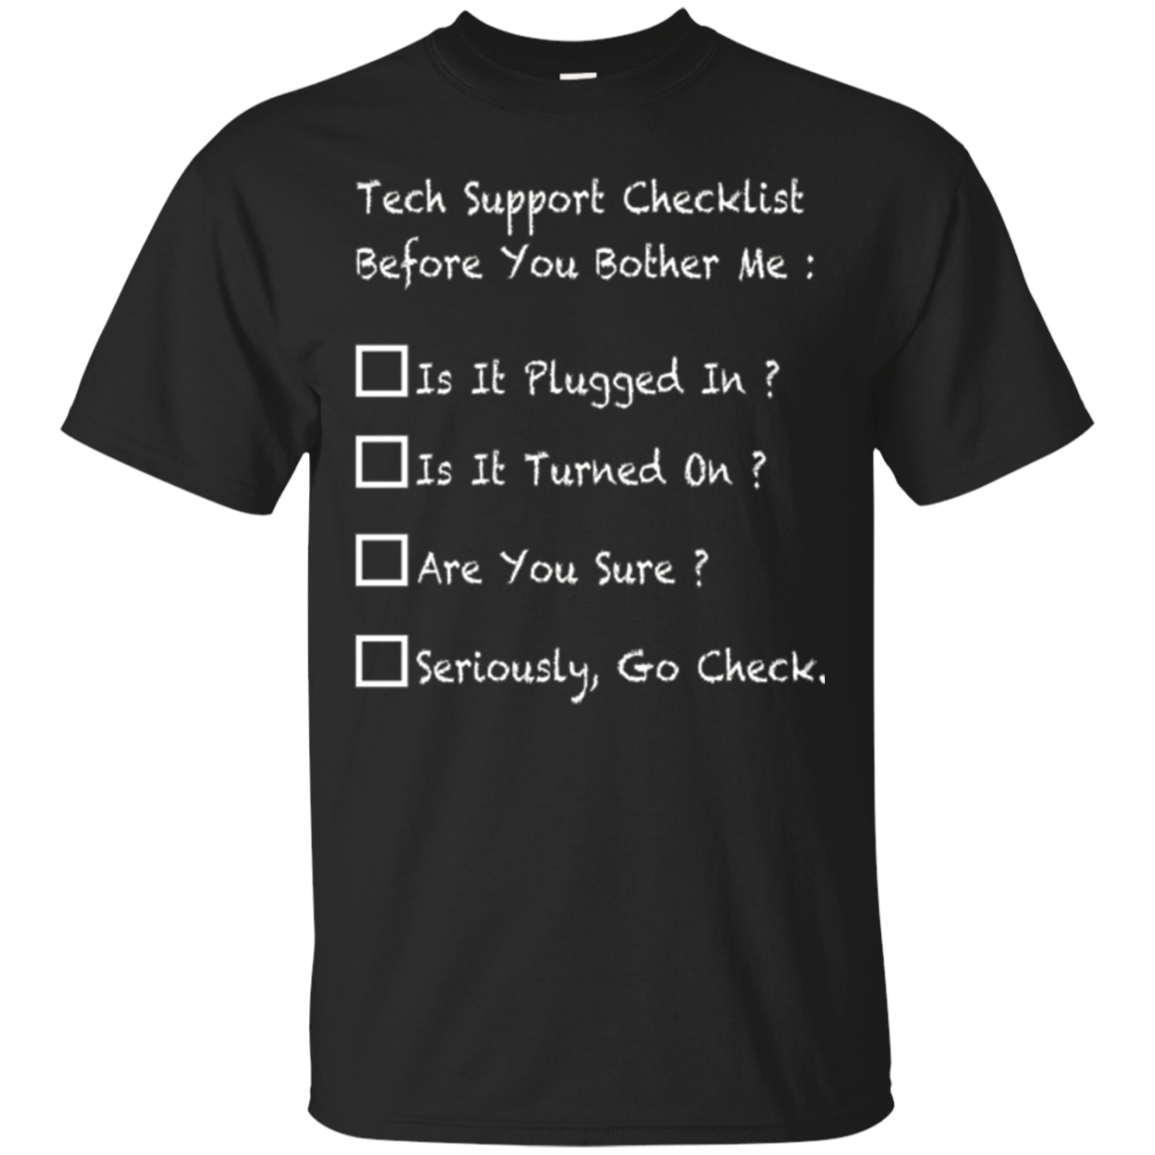 Funny Tech Support Checklist Helpdesk Hotline Shirts